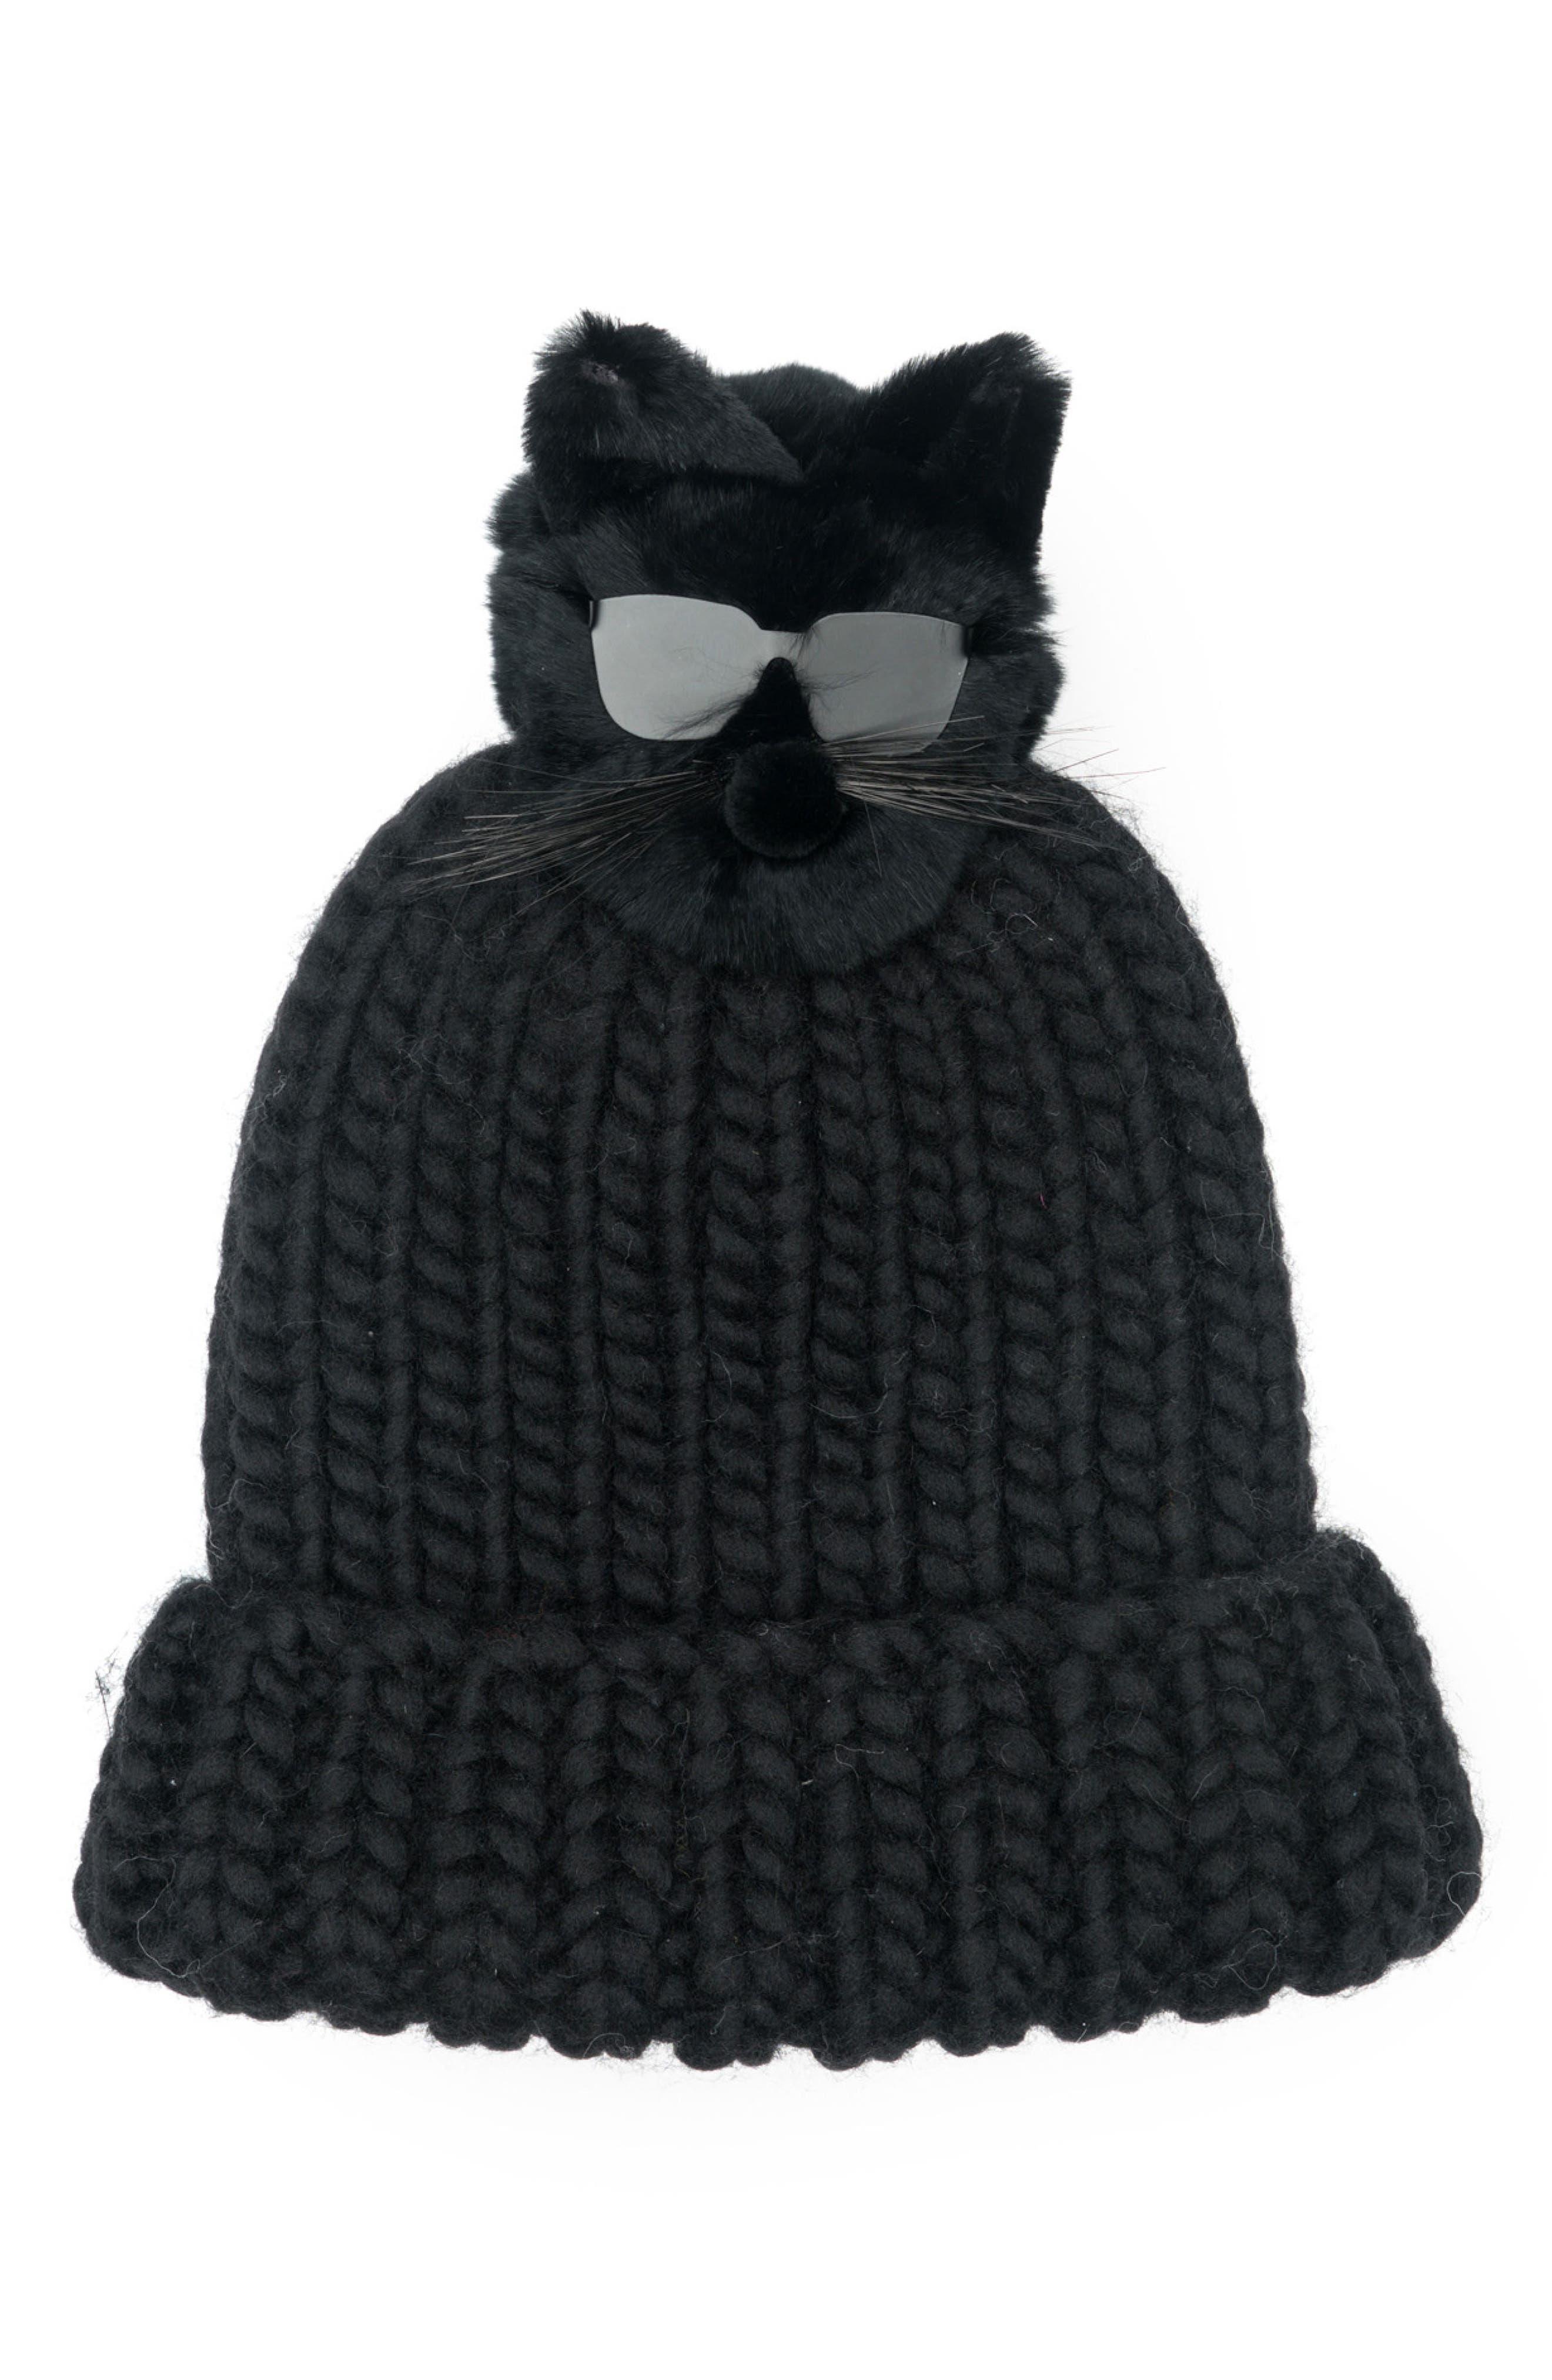 Rain Wool Stocking Cap with Genuine Fox Fur Pom,                         Main,                         color, Black